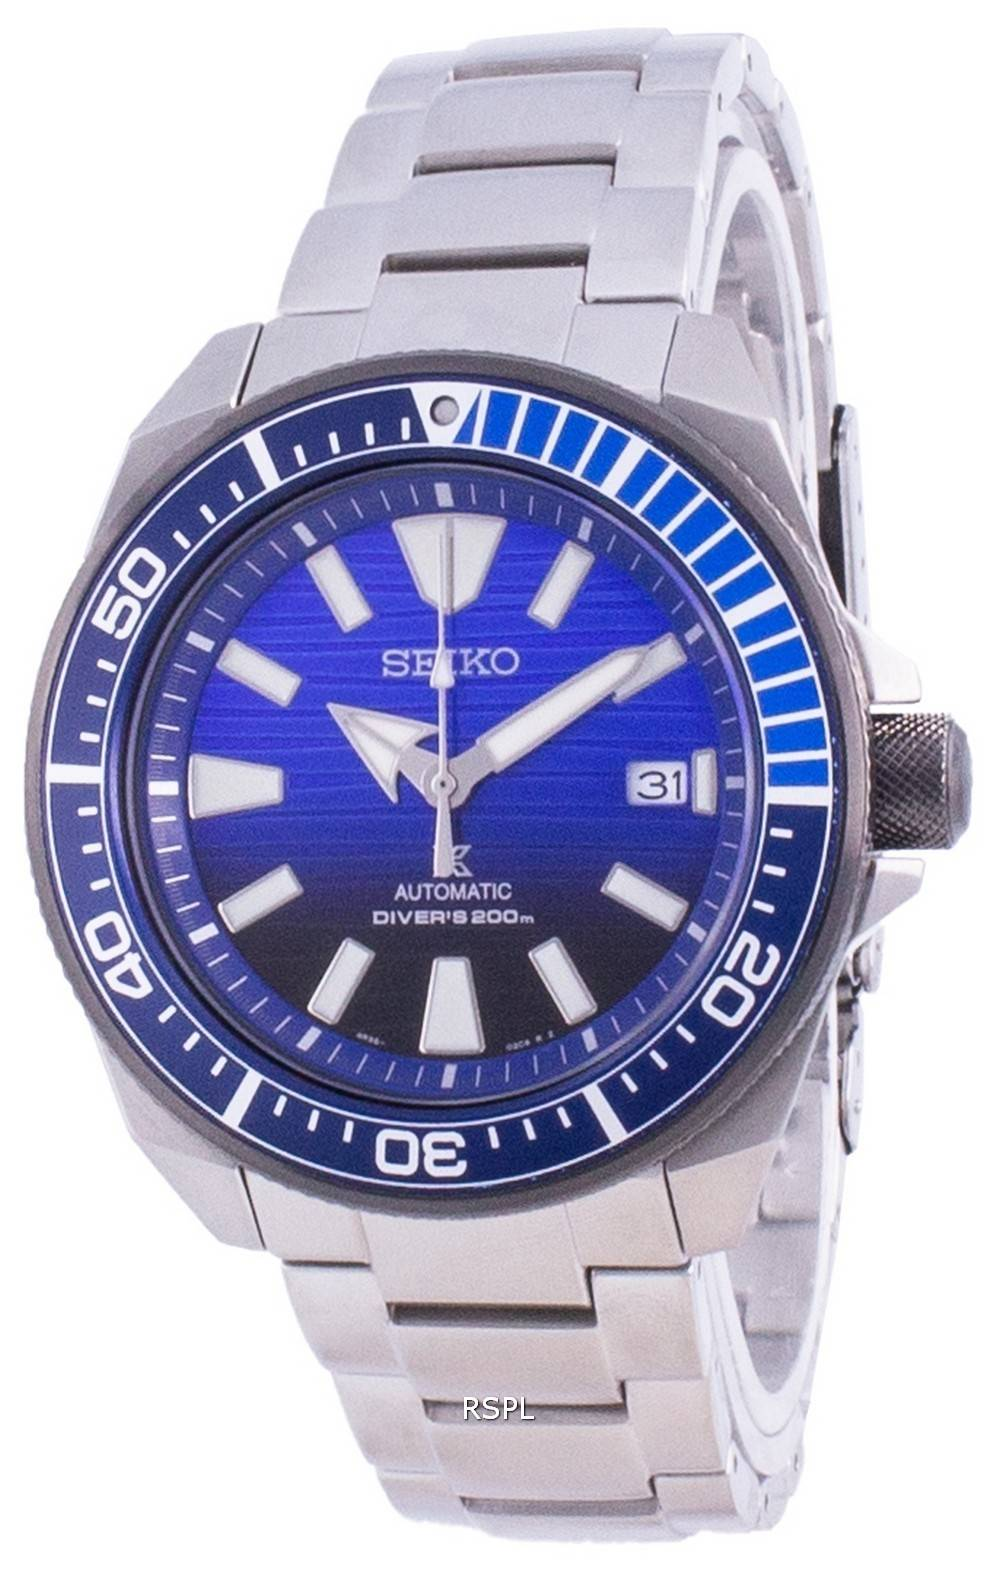 Seiko Prospex Save The Ocean Special Edition automaattinen SRPC93K SRPC93K1 SRPC93K 200M miesten kello